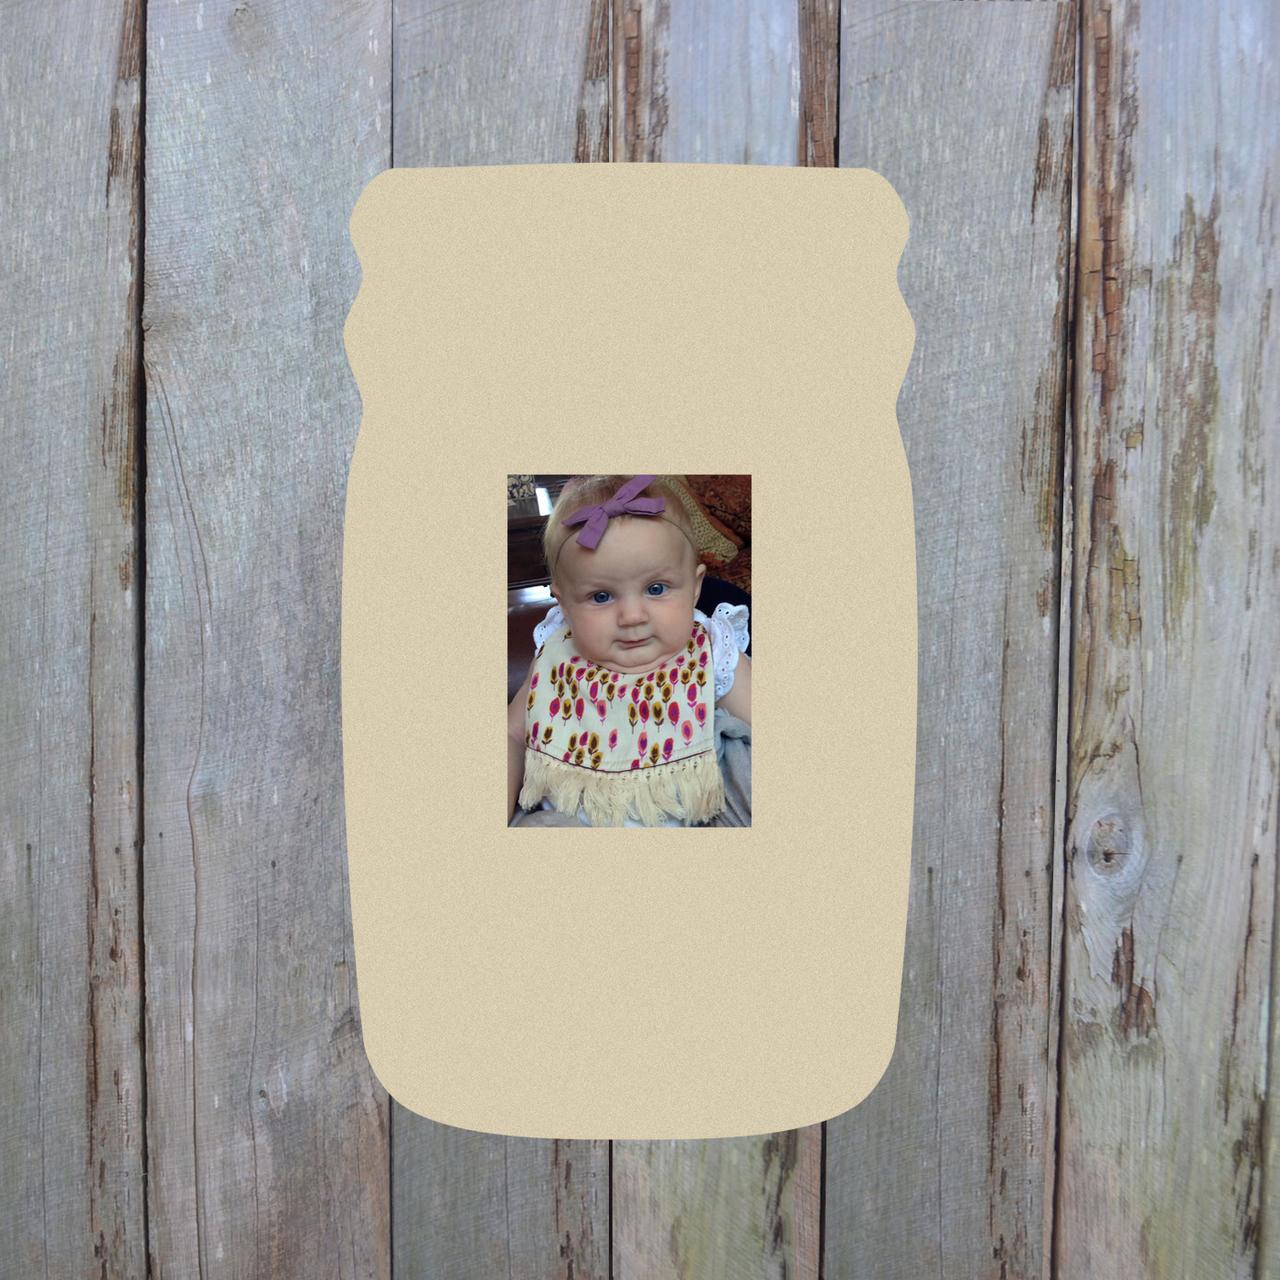 Wooden Mason Jar Custom Picture Frame, Wood Photo Frame